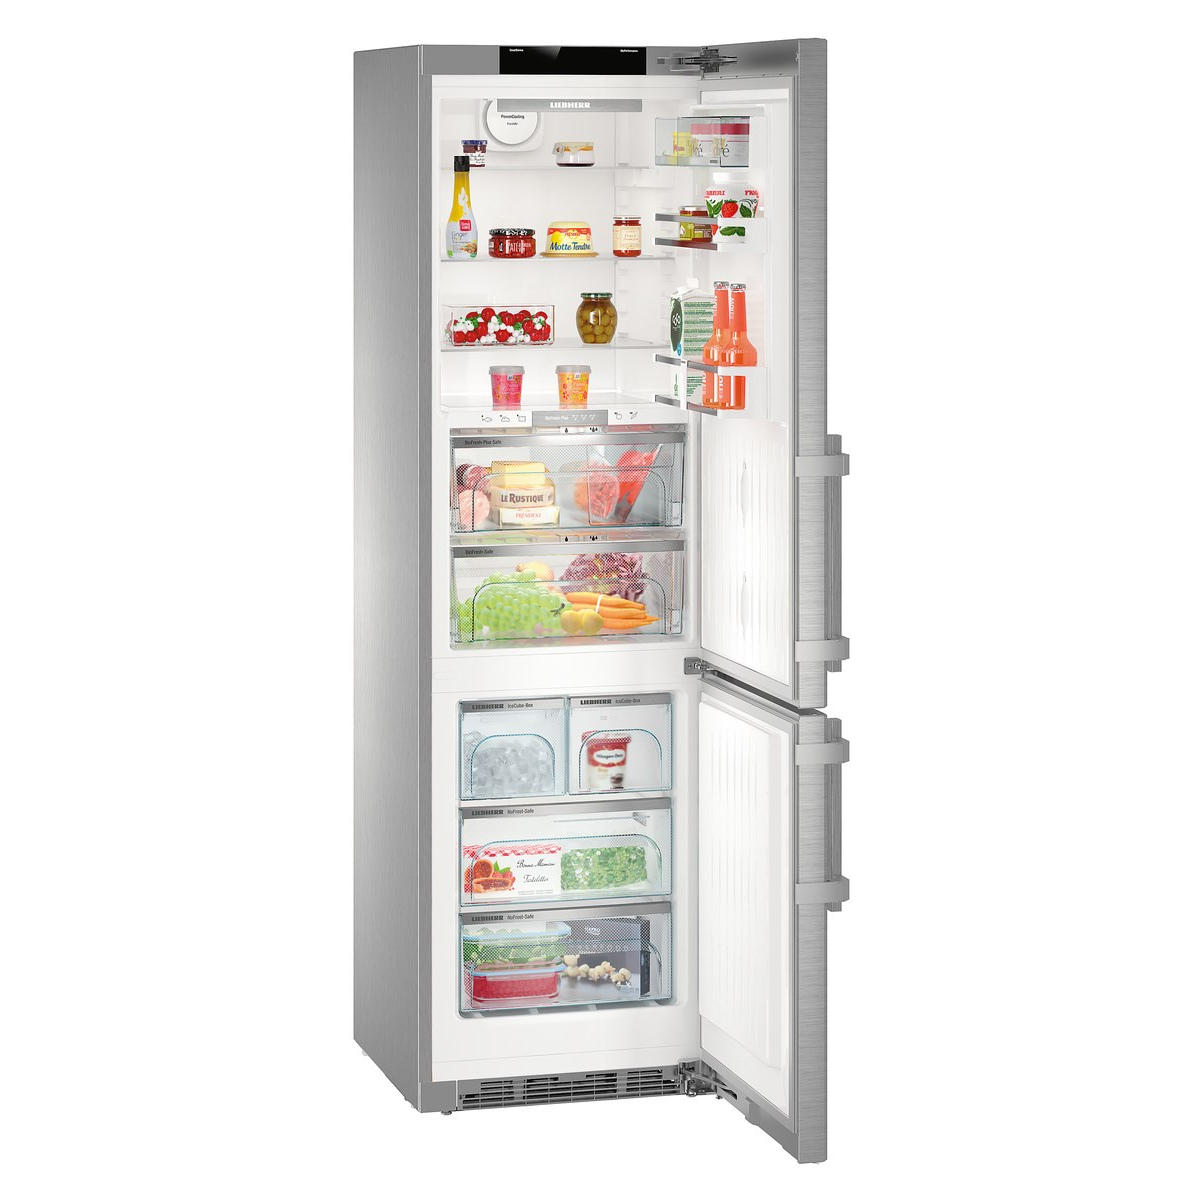 liebherr cbnpes 4878 premium biofresh nofrost fridge freezer discount appliance centre. Black Bedroom Furniture Sets. Home Design Ideas